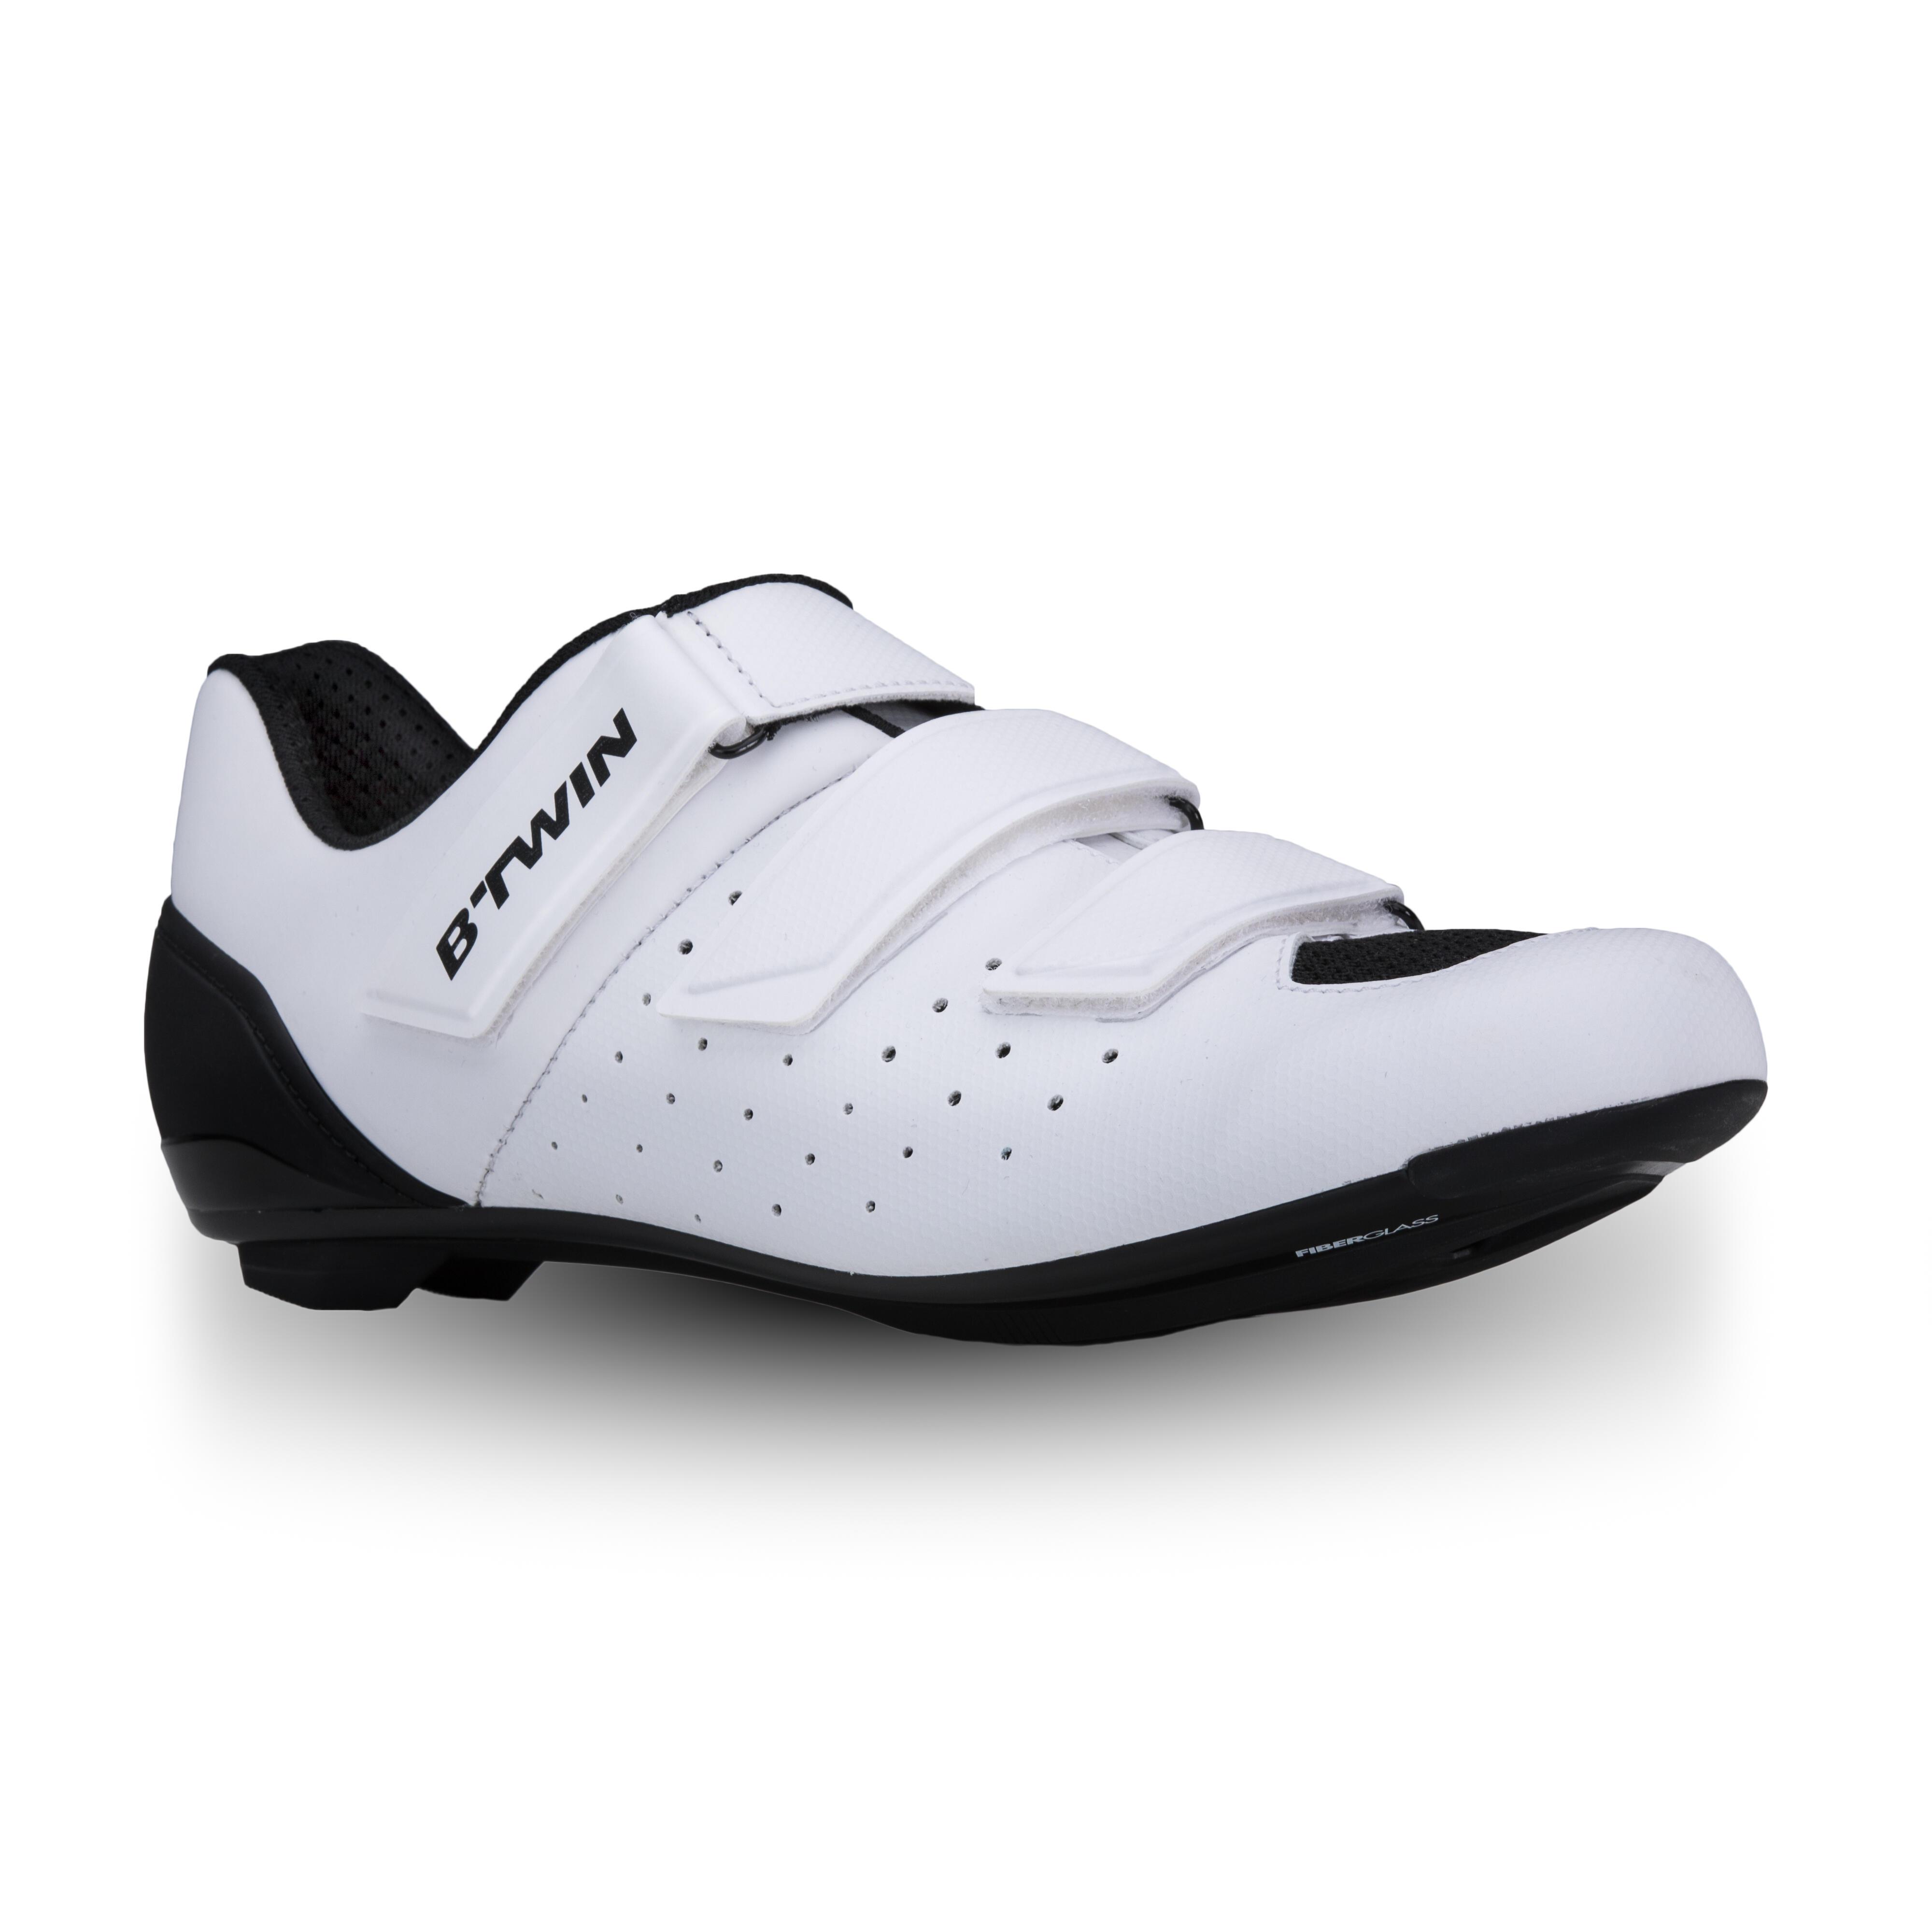 Fahrrad-Schuhe Rennrad RR 500 weiß | Schuhe > Sportschuhe > Fahrradschuhe | Weiß | B´twin